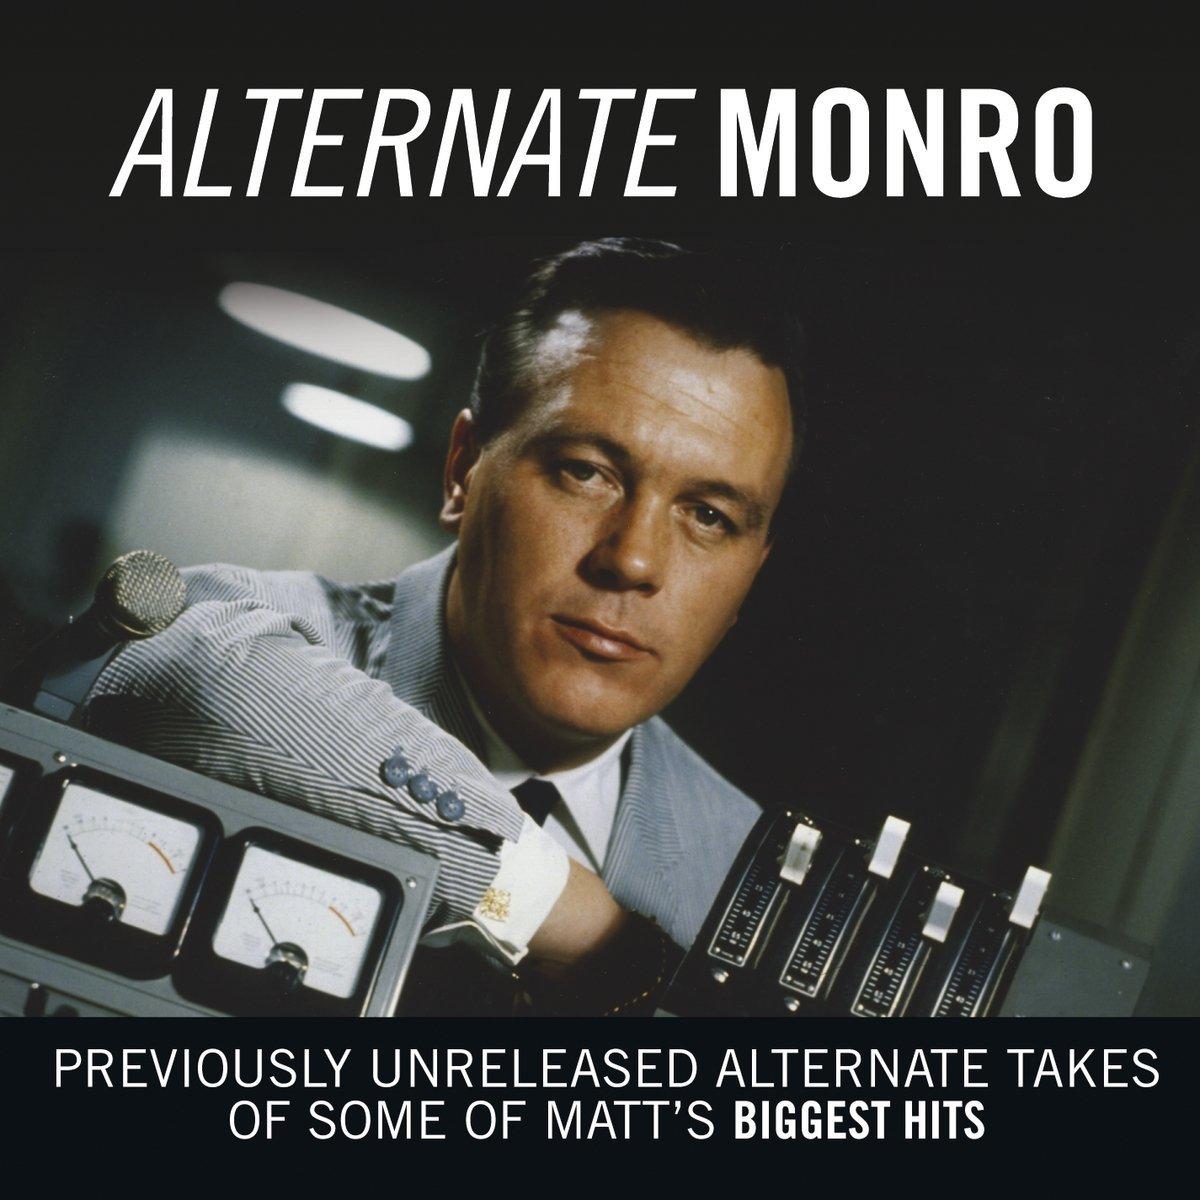 Alternate Monro